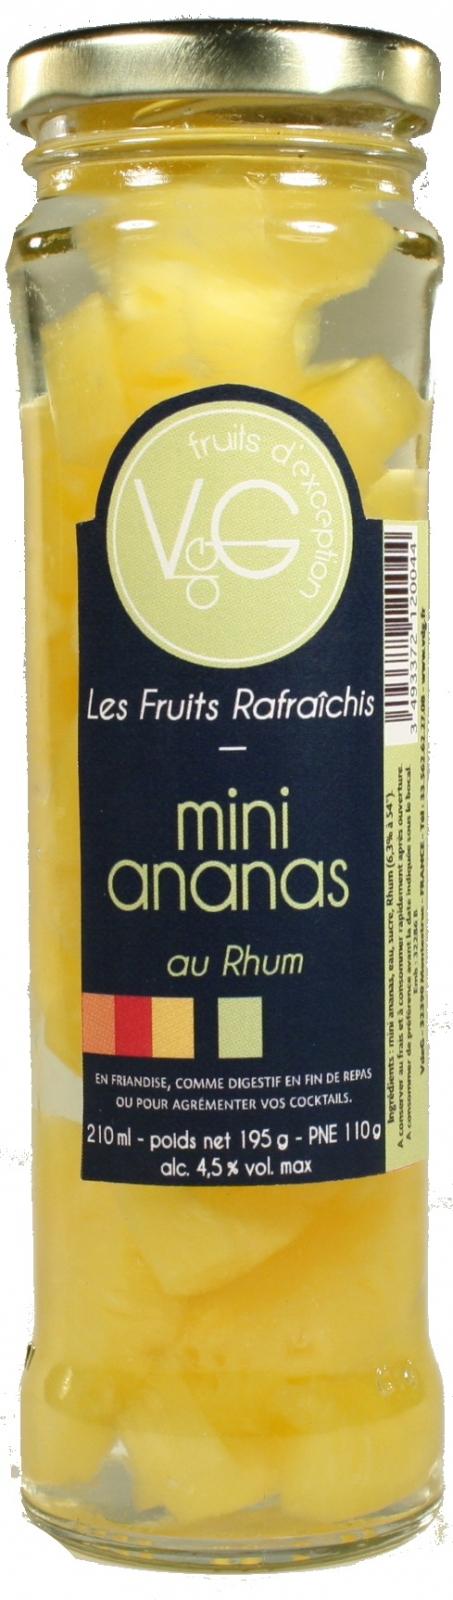 Mini ananas Rhum Verger de Gascogne